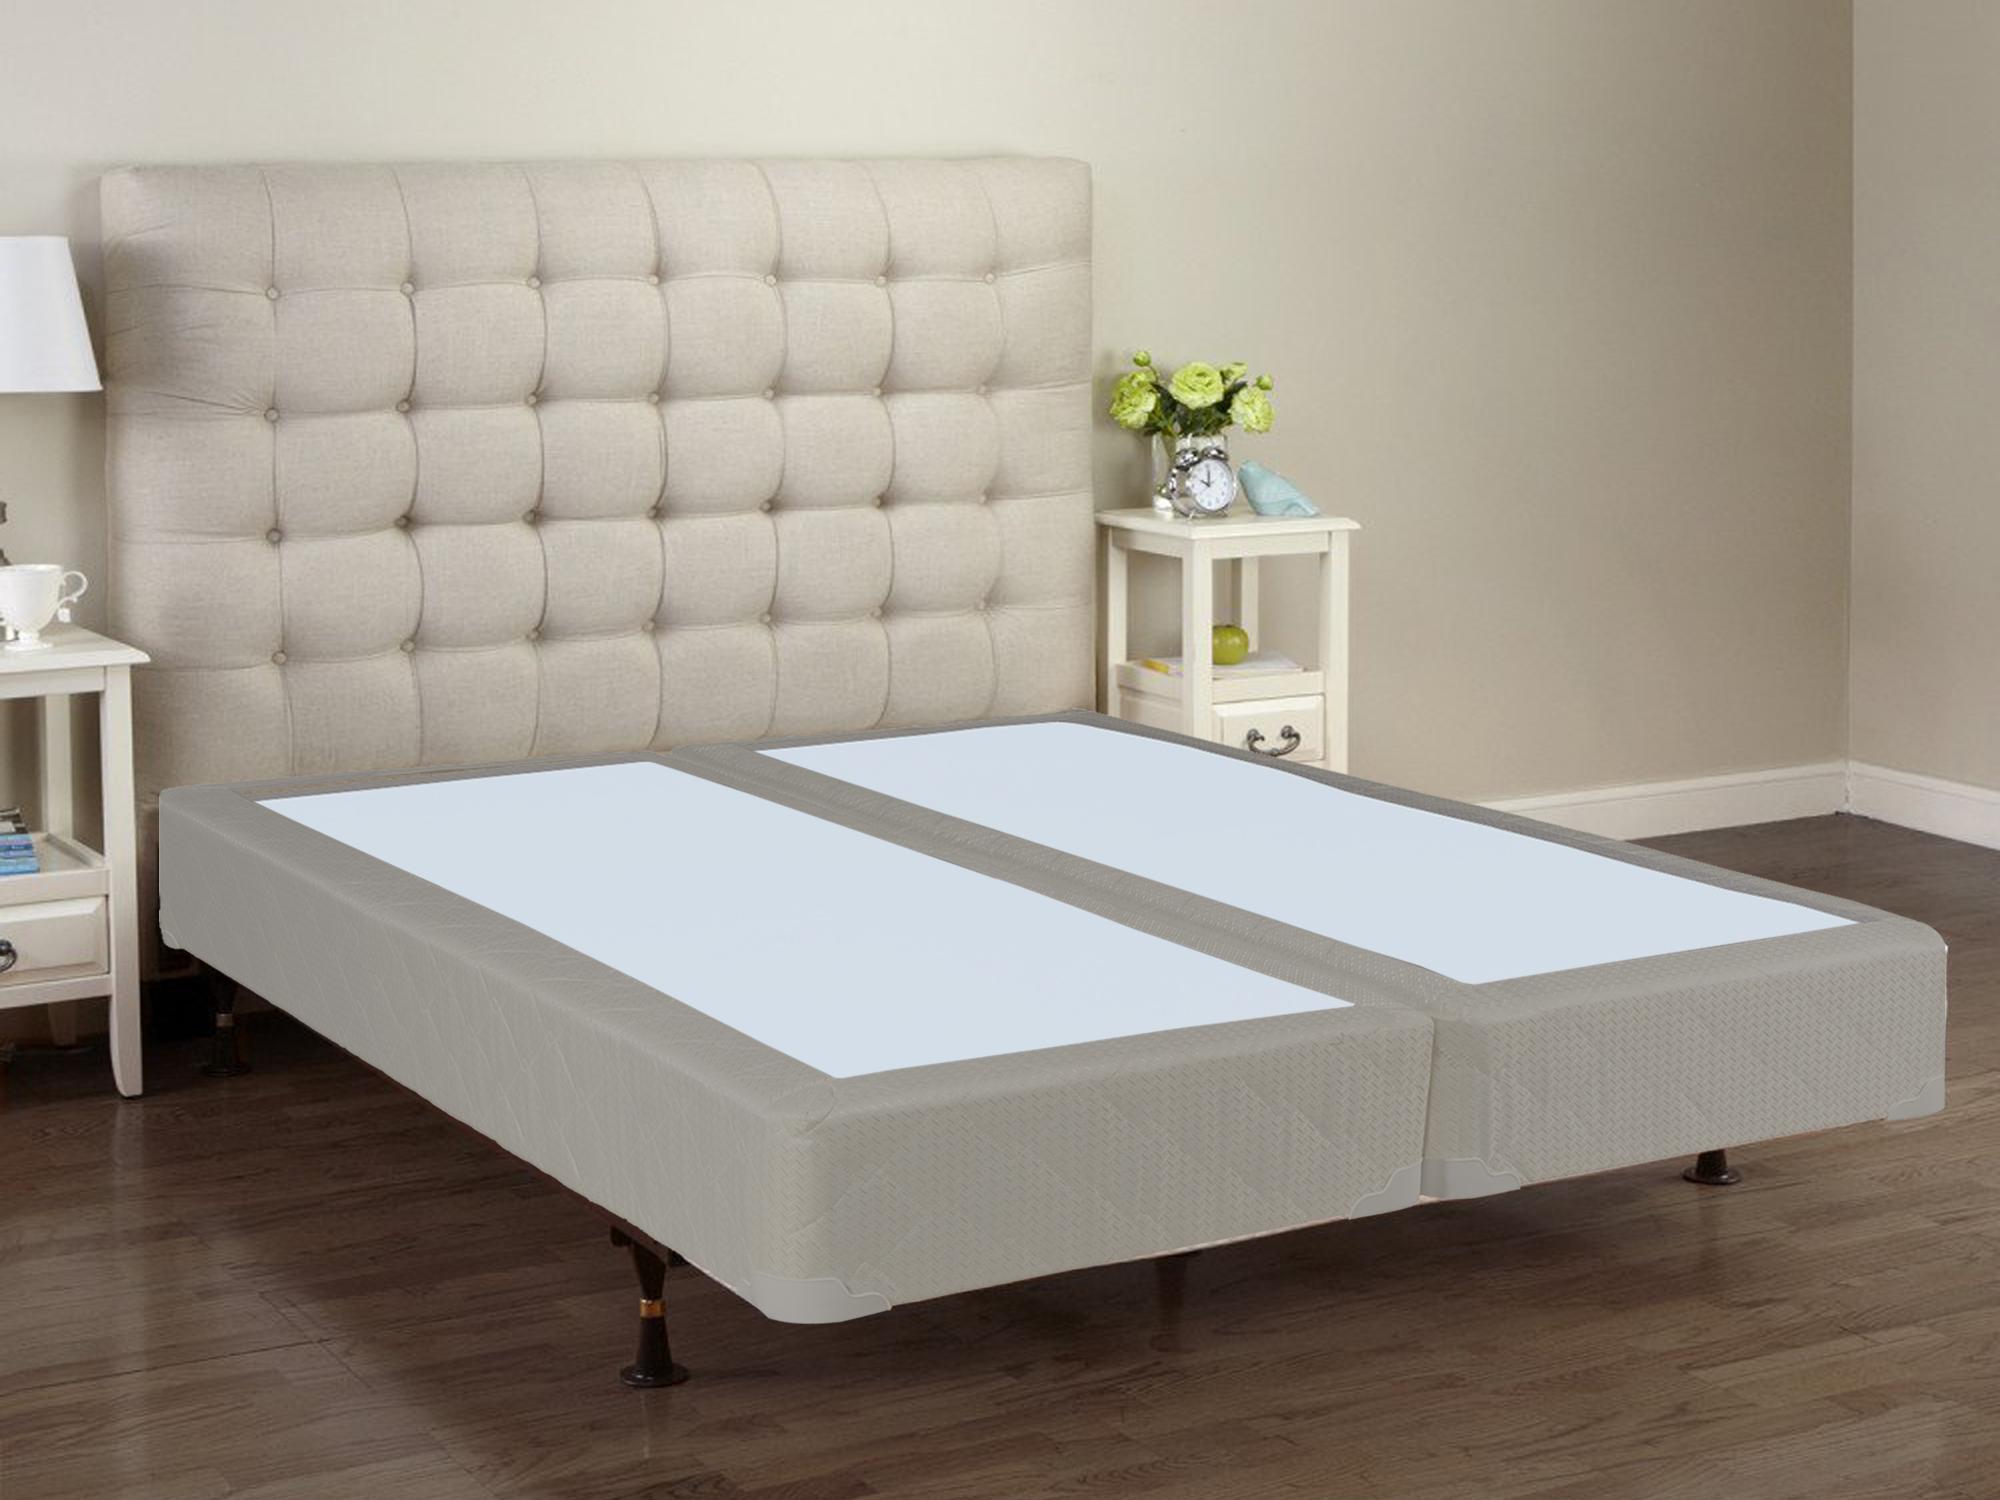 continental sleep 8 fully assembled semi flex split box spring foundation for mattress king. Black Bedroom Furniture Sets. Home Design Ideas